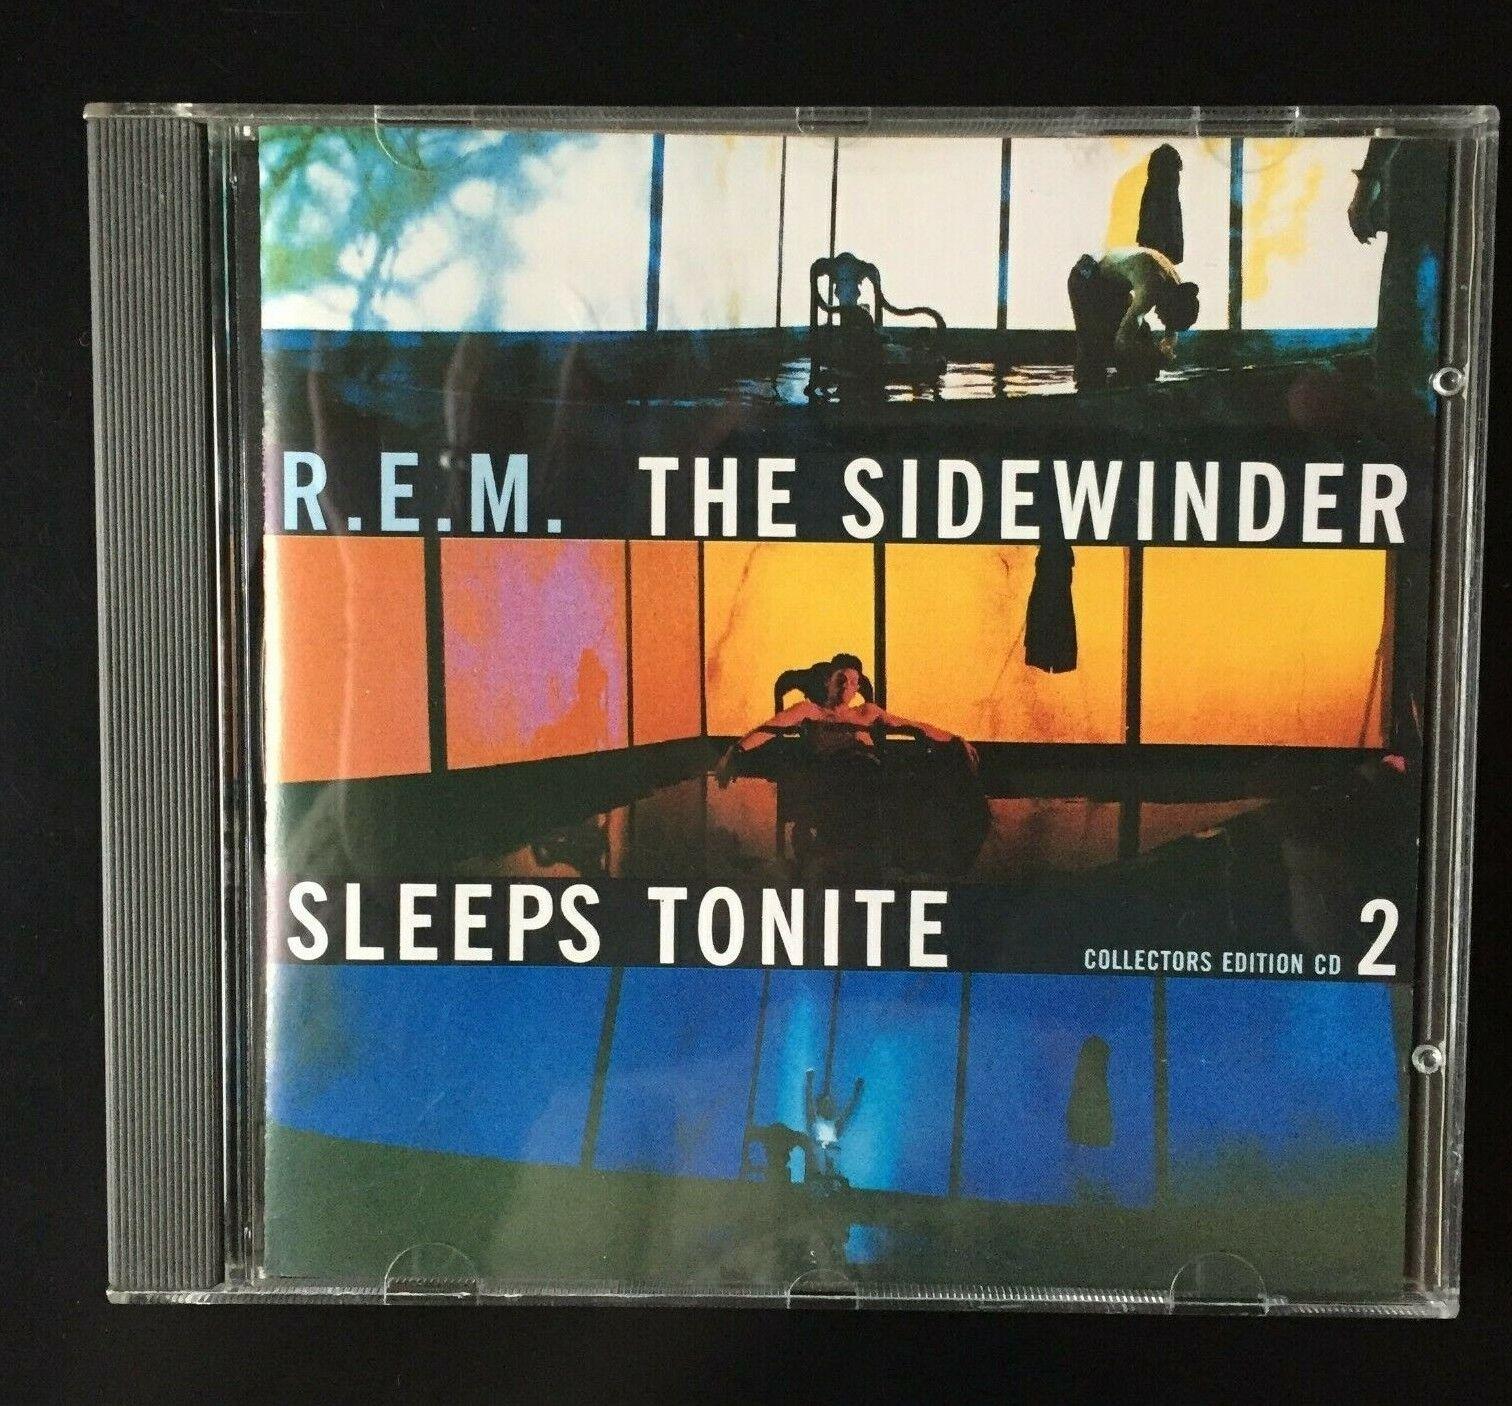 R.E.M. -  The Sidewinder Sleeps Tonite 1993 CD Single W0152CD2 NM/NM